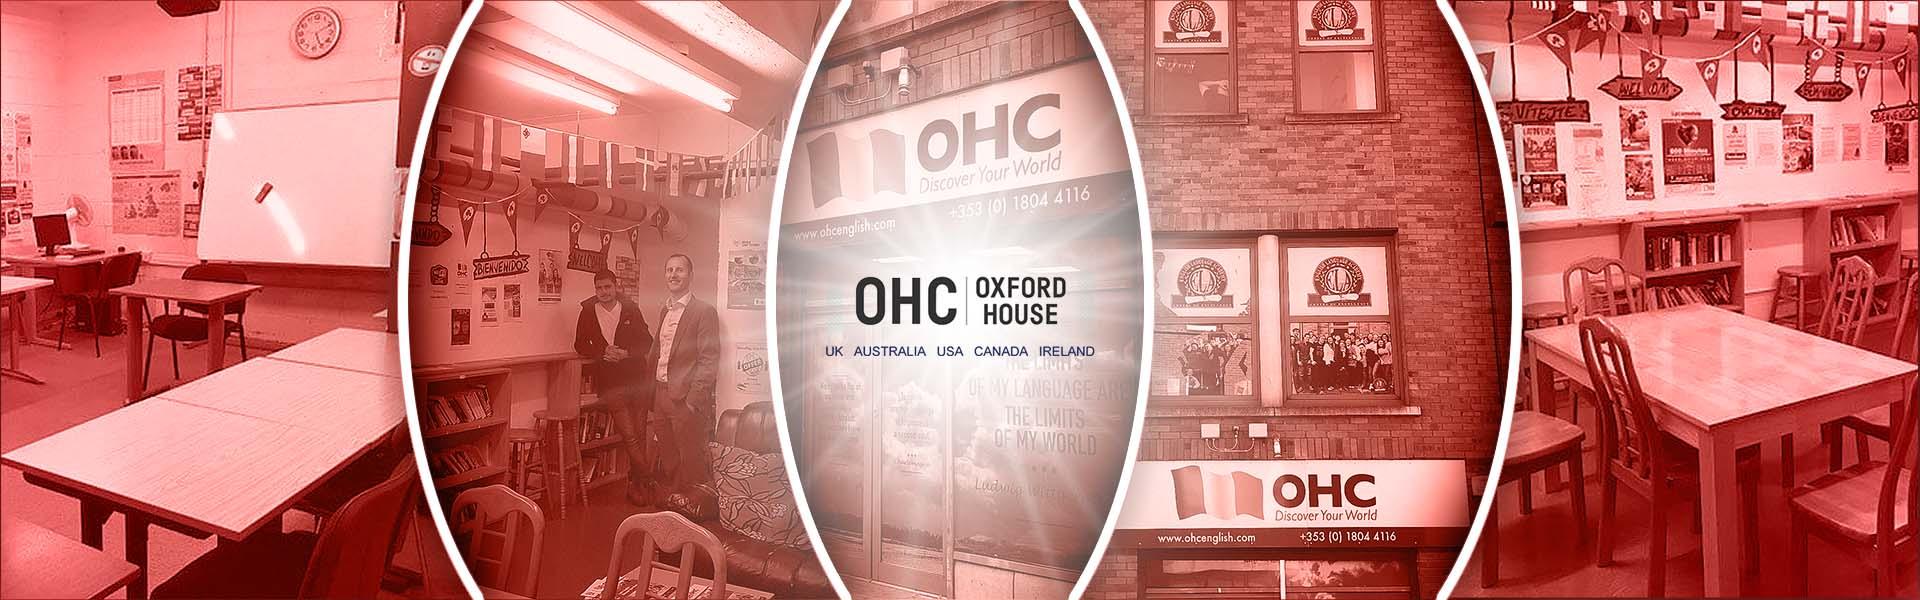 OHC Dublin Dil Okulu